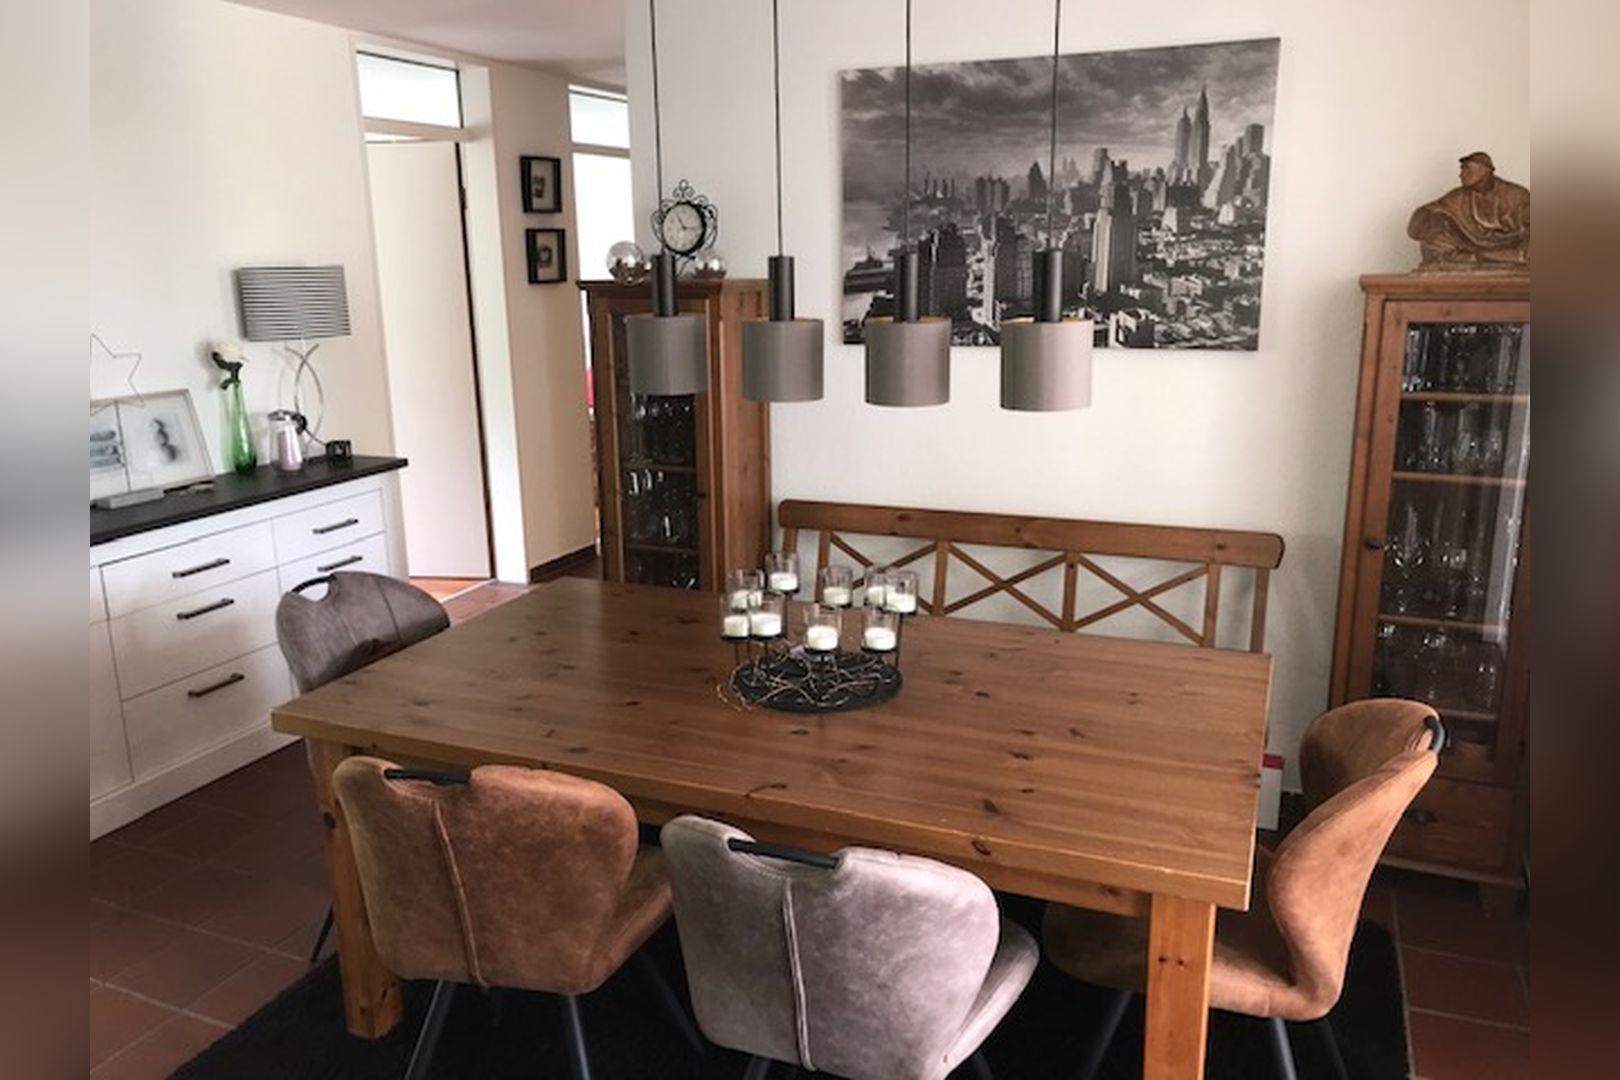 Immobilie Nr.0264 | Leipziger Straße 15, 40668 Meerbusch Lank-Latum